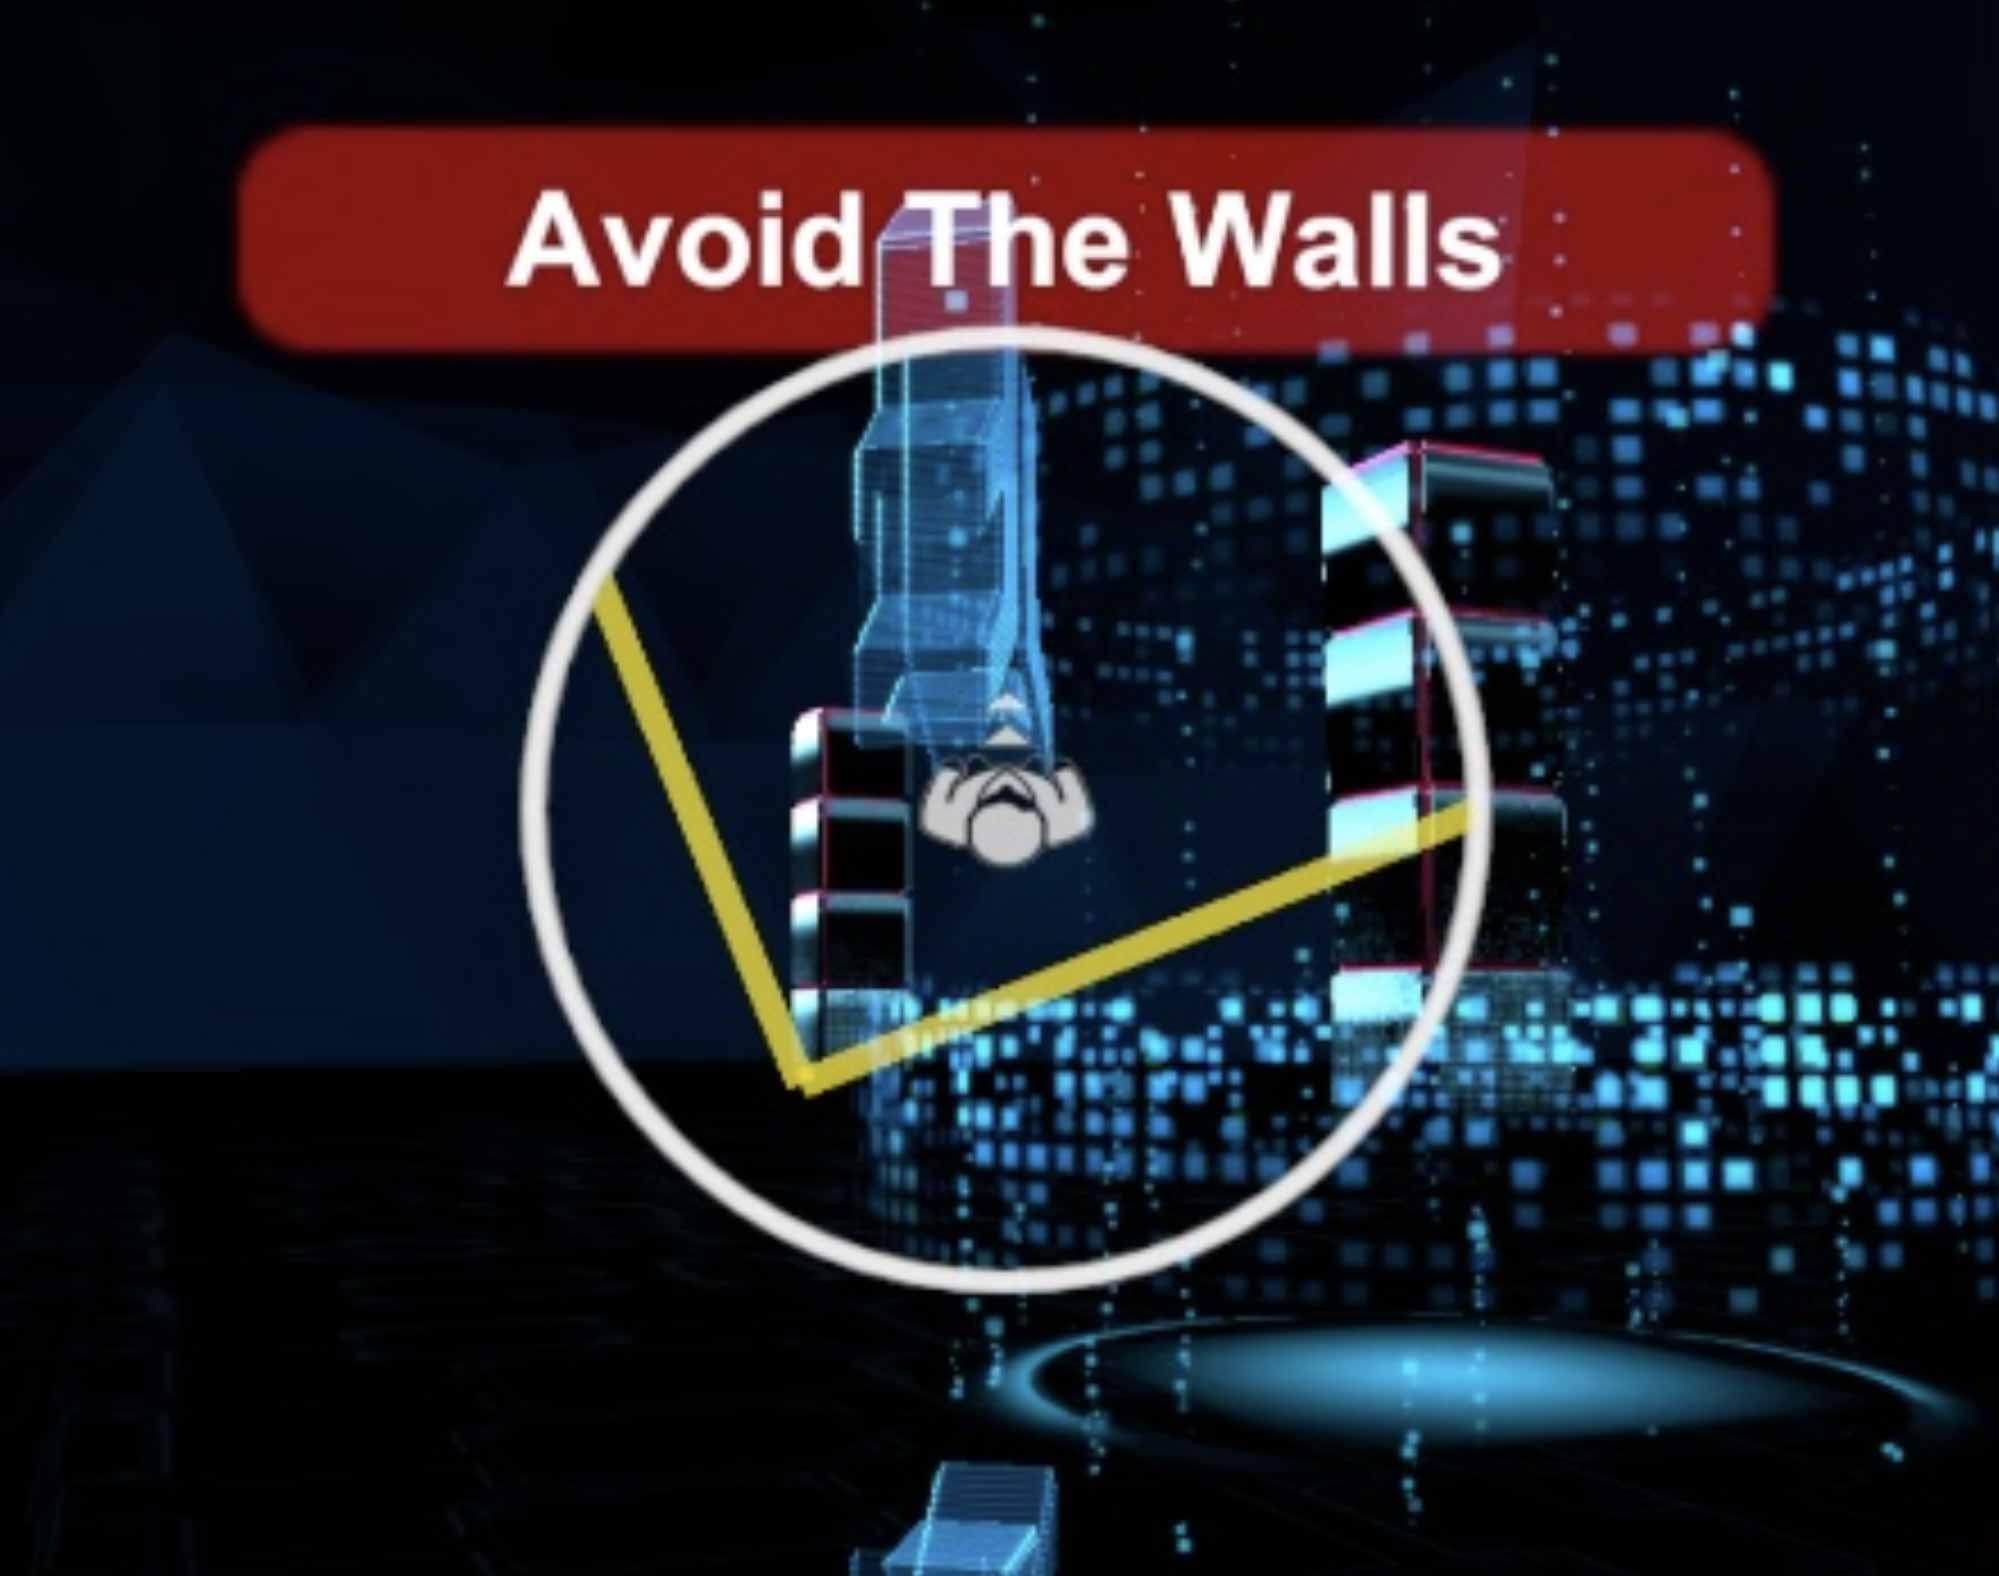 image-zerolatency-avoid-the-walls.jpg